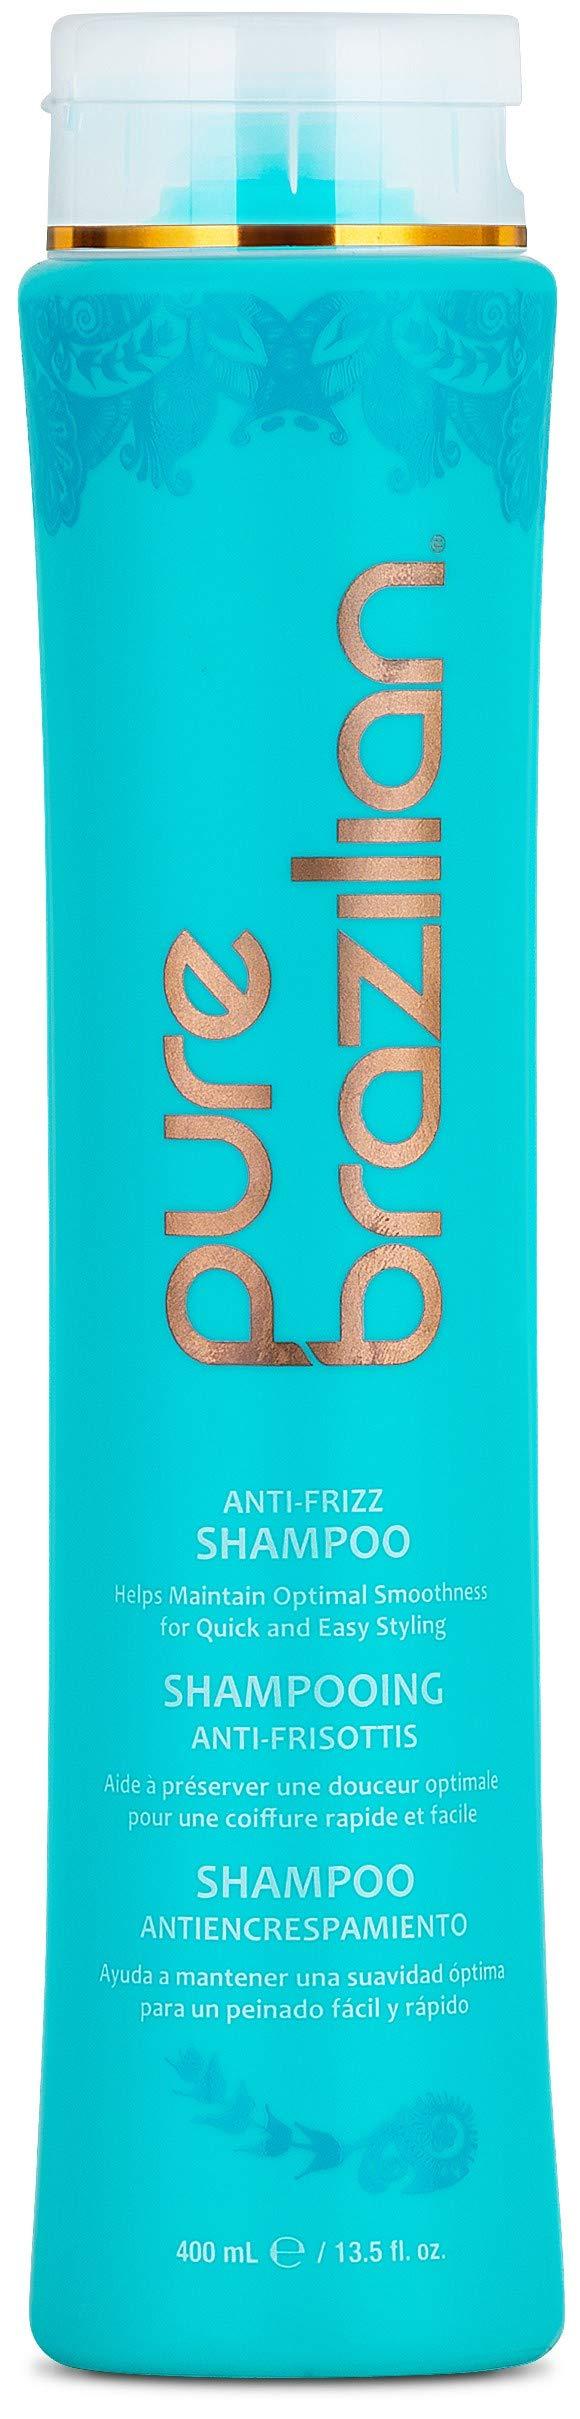 Pure Brazilian - Anti Frizz Daily Shampoo - Salt-Free, Color Safe, With Keratin, Argan Oil, and Acai (13.5 Fl. Ounces / 400 Milliliter) by Pure Brazilian